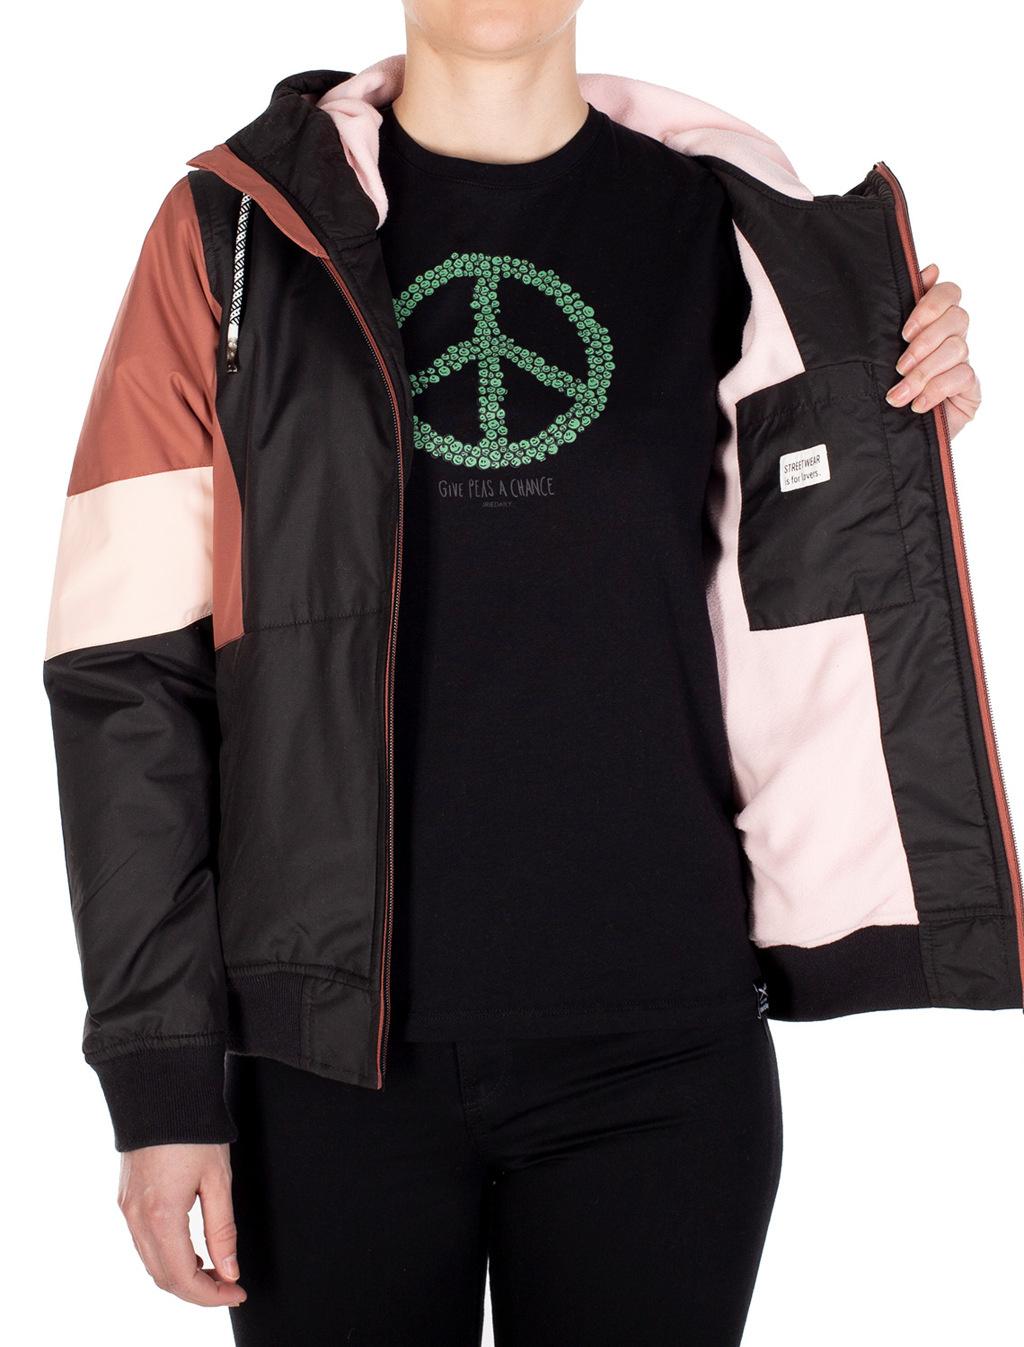 Blotchy Jacket - Black rose-2